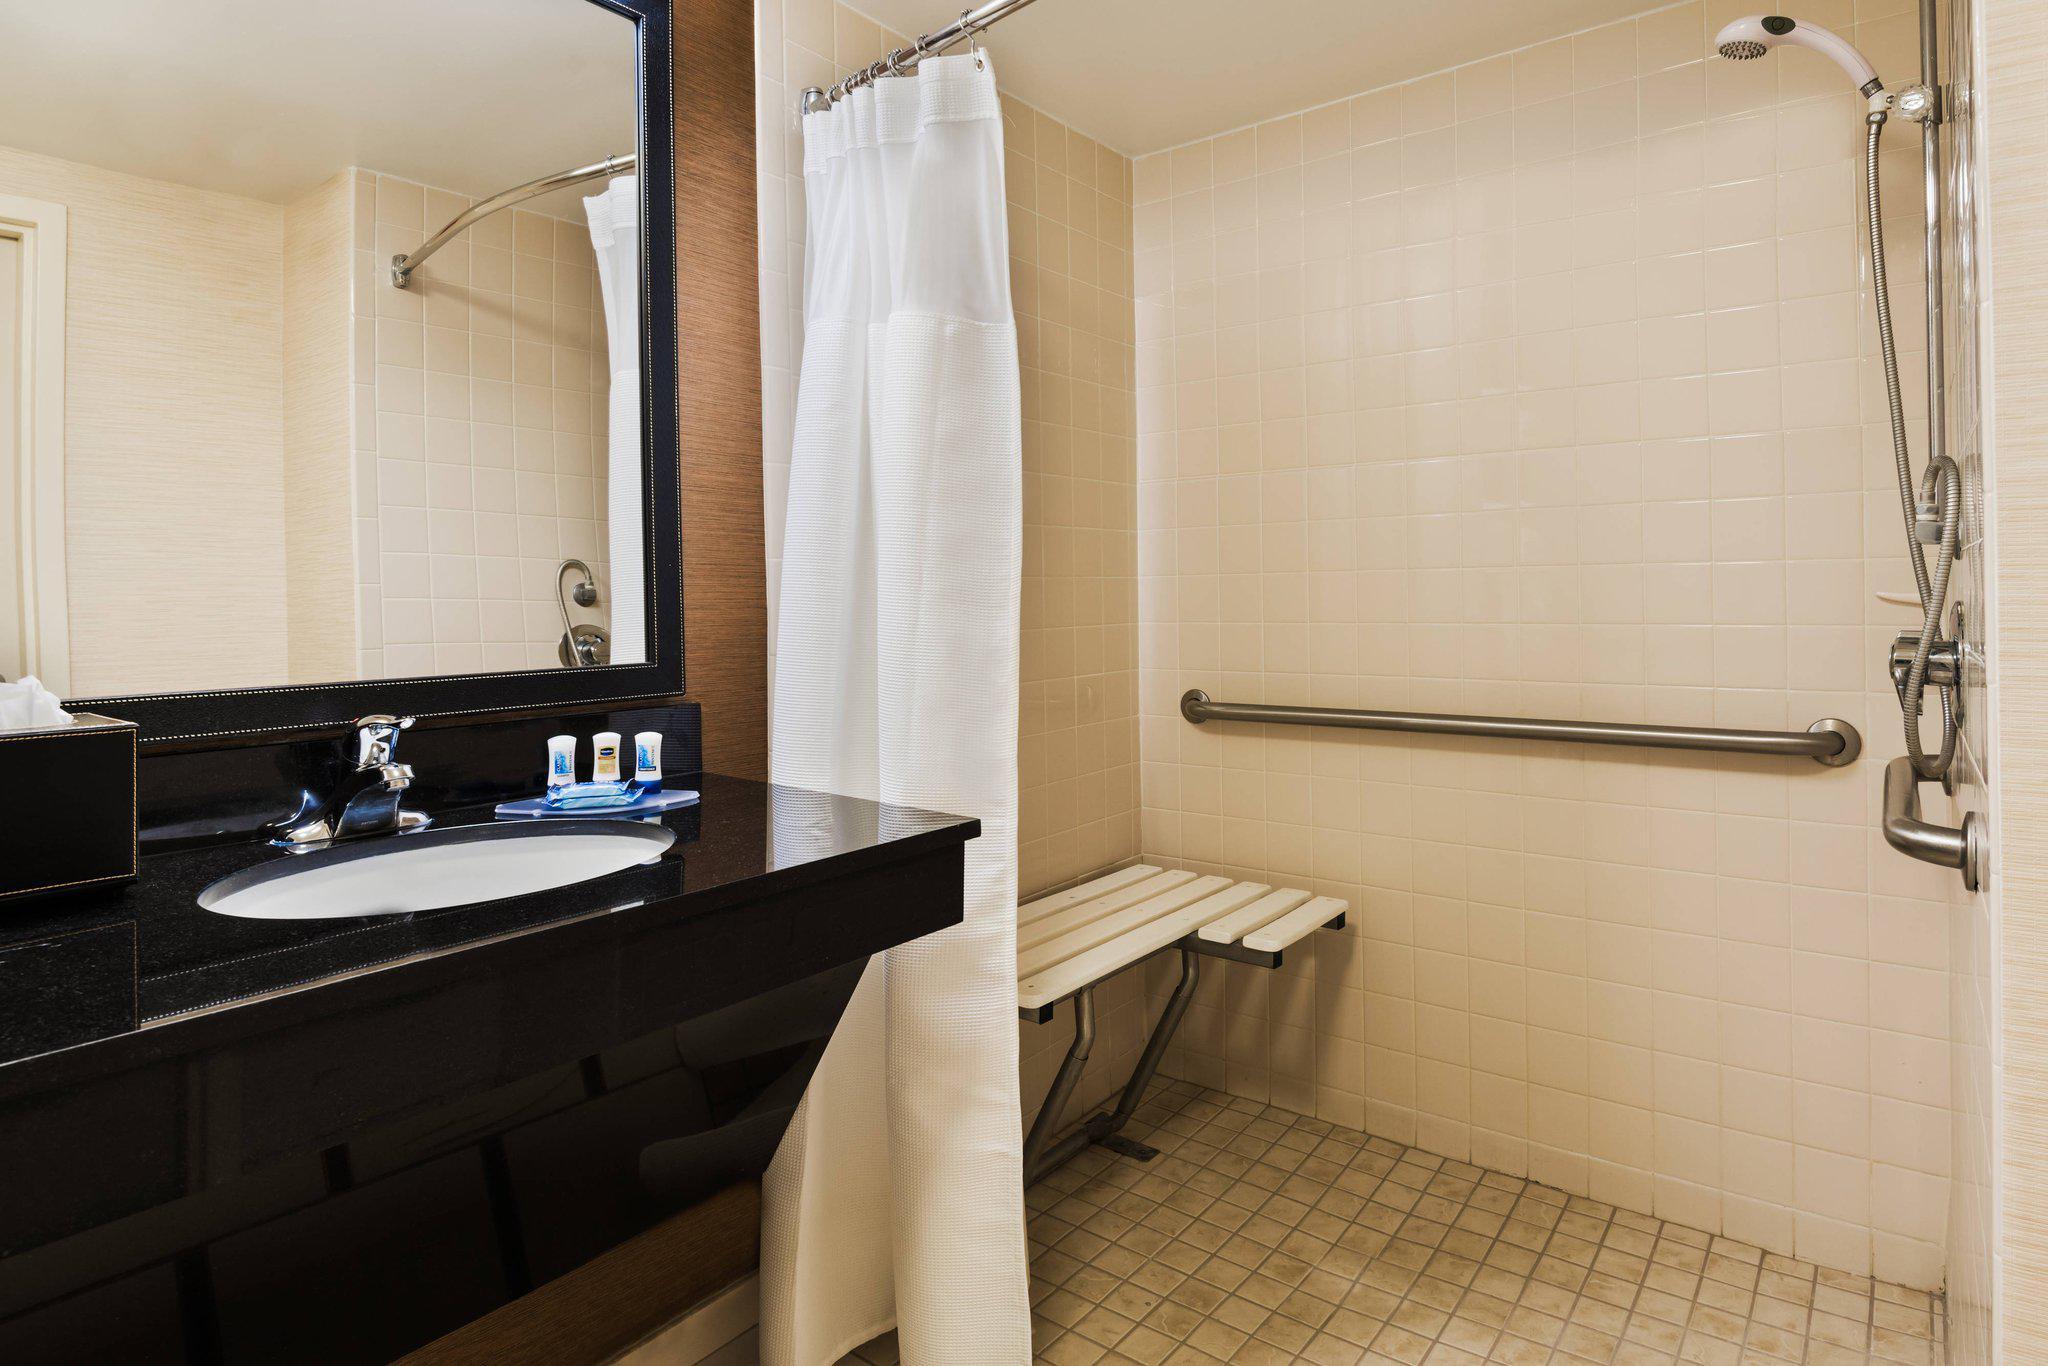 Fairfield Inn & Suites by Marriott Clearwater in Clearwater, FL, photo #12